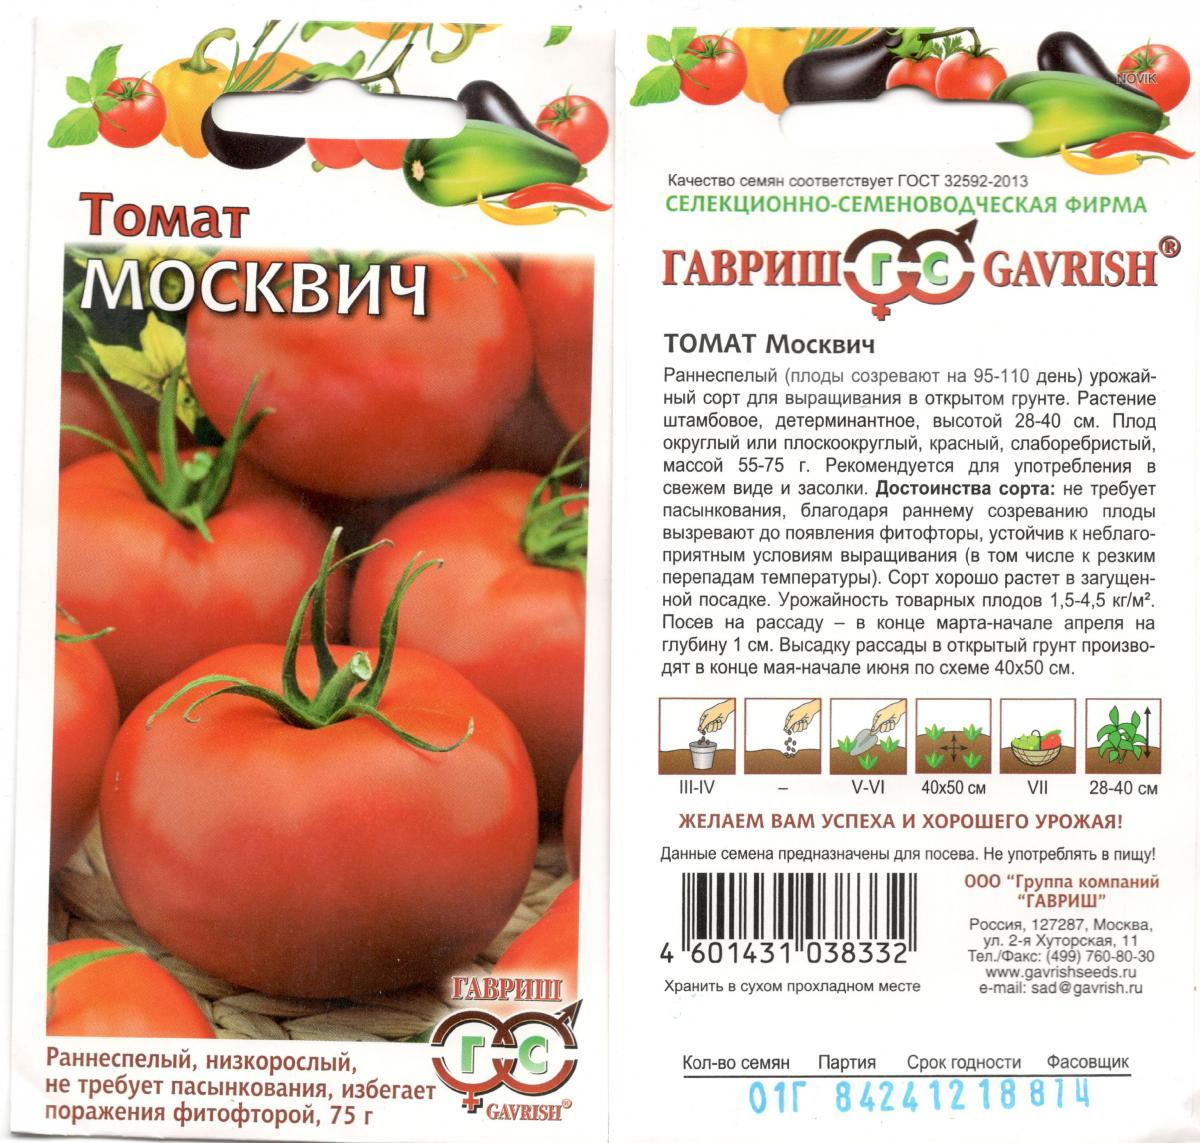 томат москвич отзывы и фото зимние